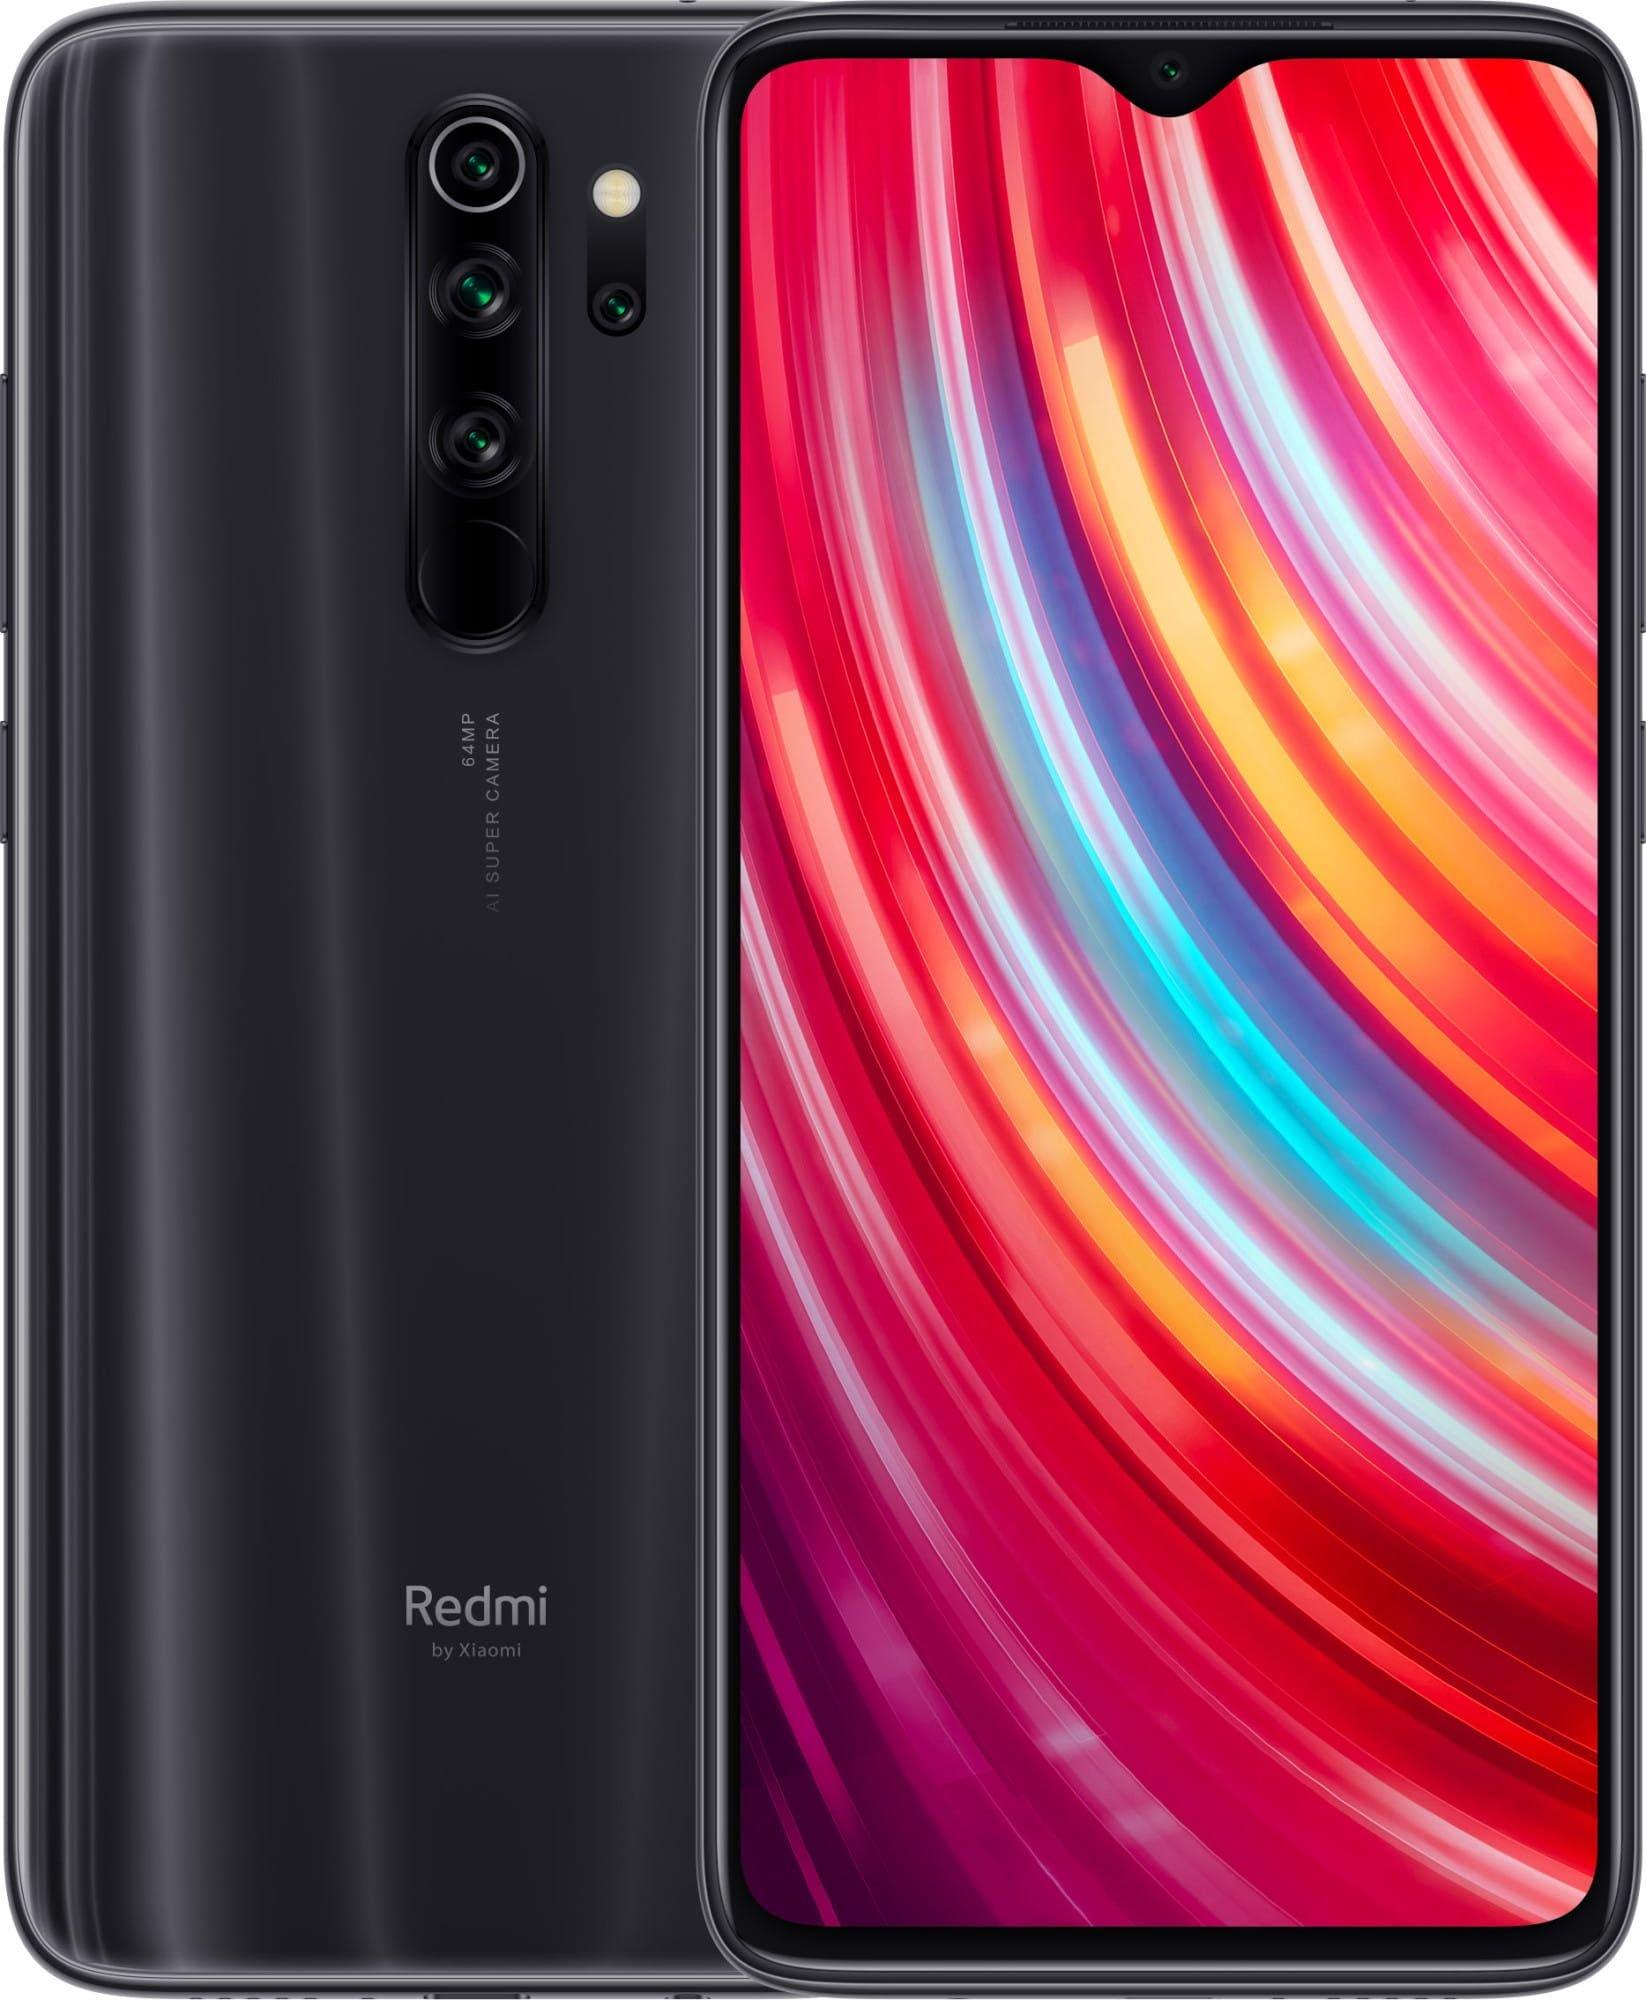 Smartfon Xiaomi Redmi Note 8 Pro 6/128GB Mineral Grey (25540) 25540 BAL Mobilais Telefons